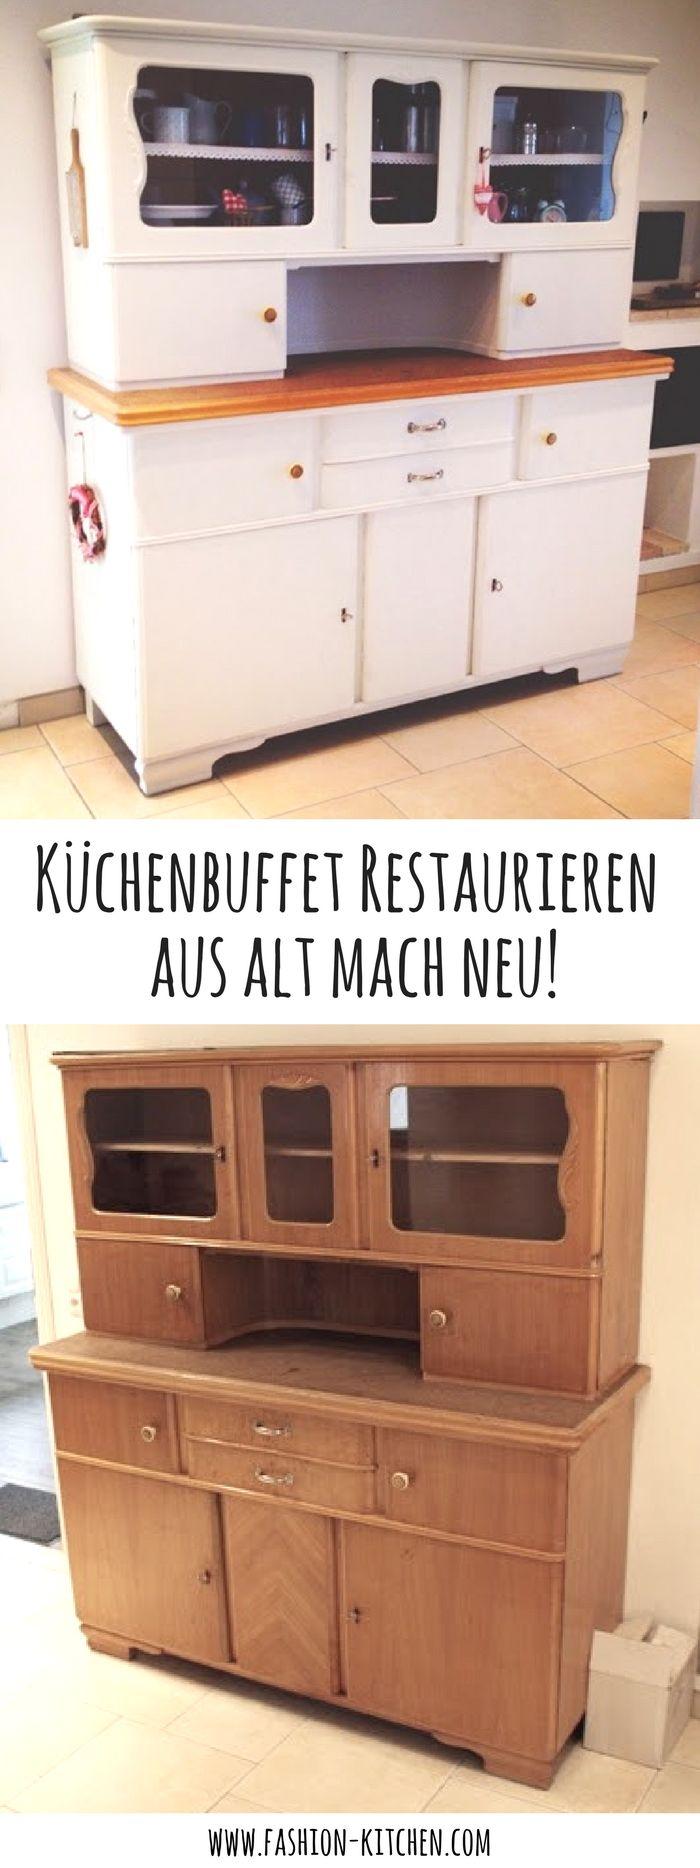 Küchenbuffet DIY – aus alt mach neu